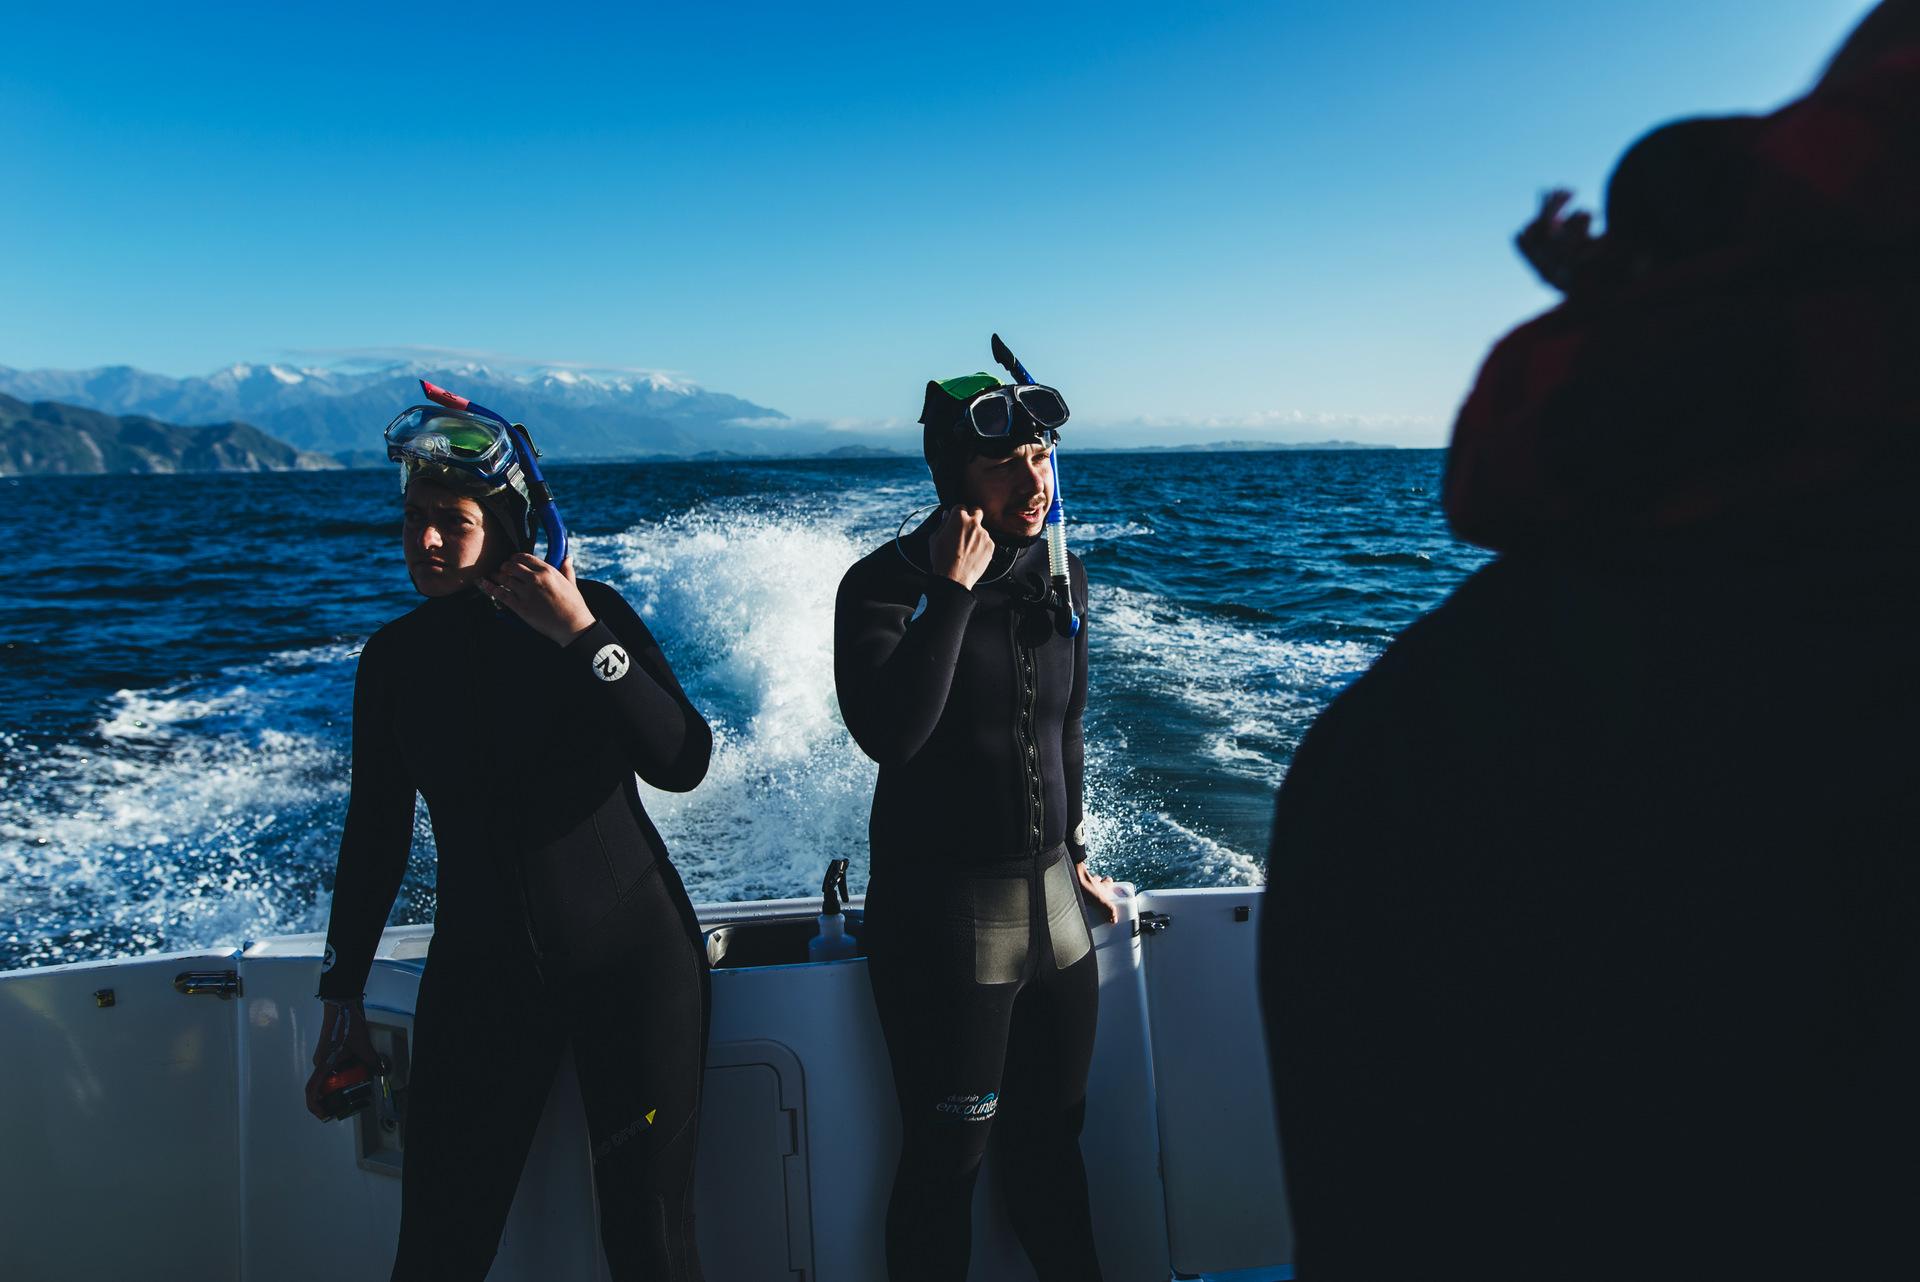 delfiny nowa zelandia